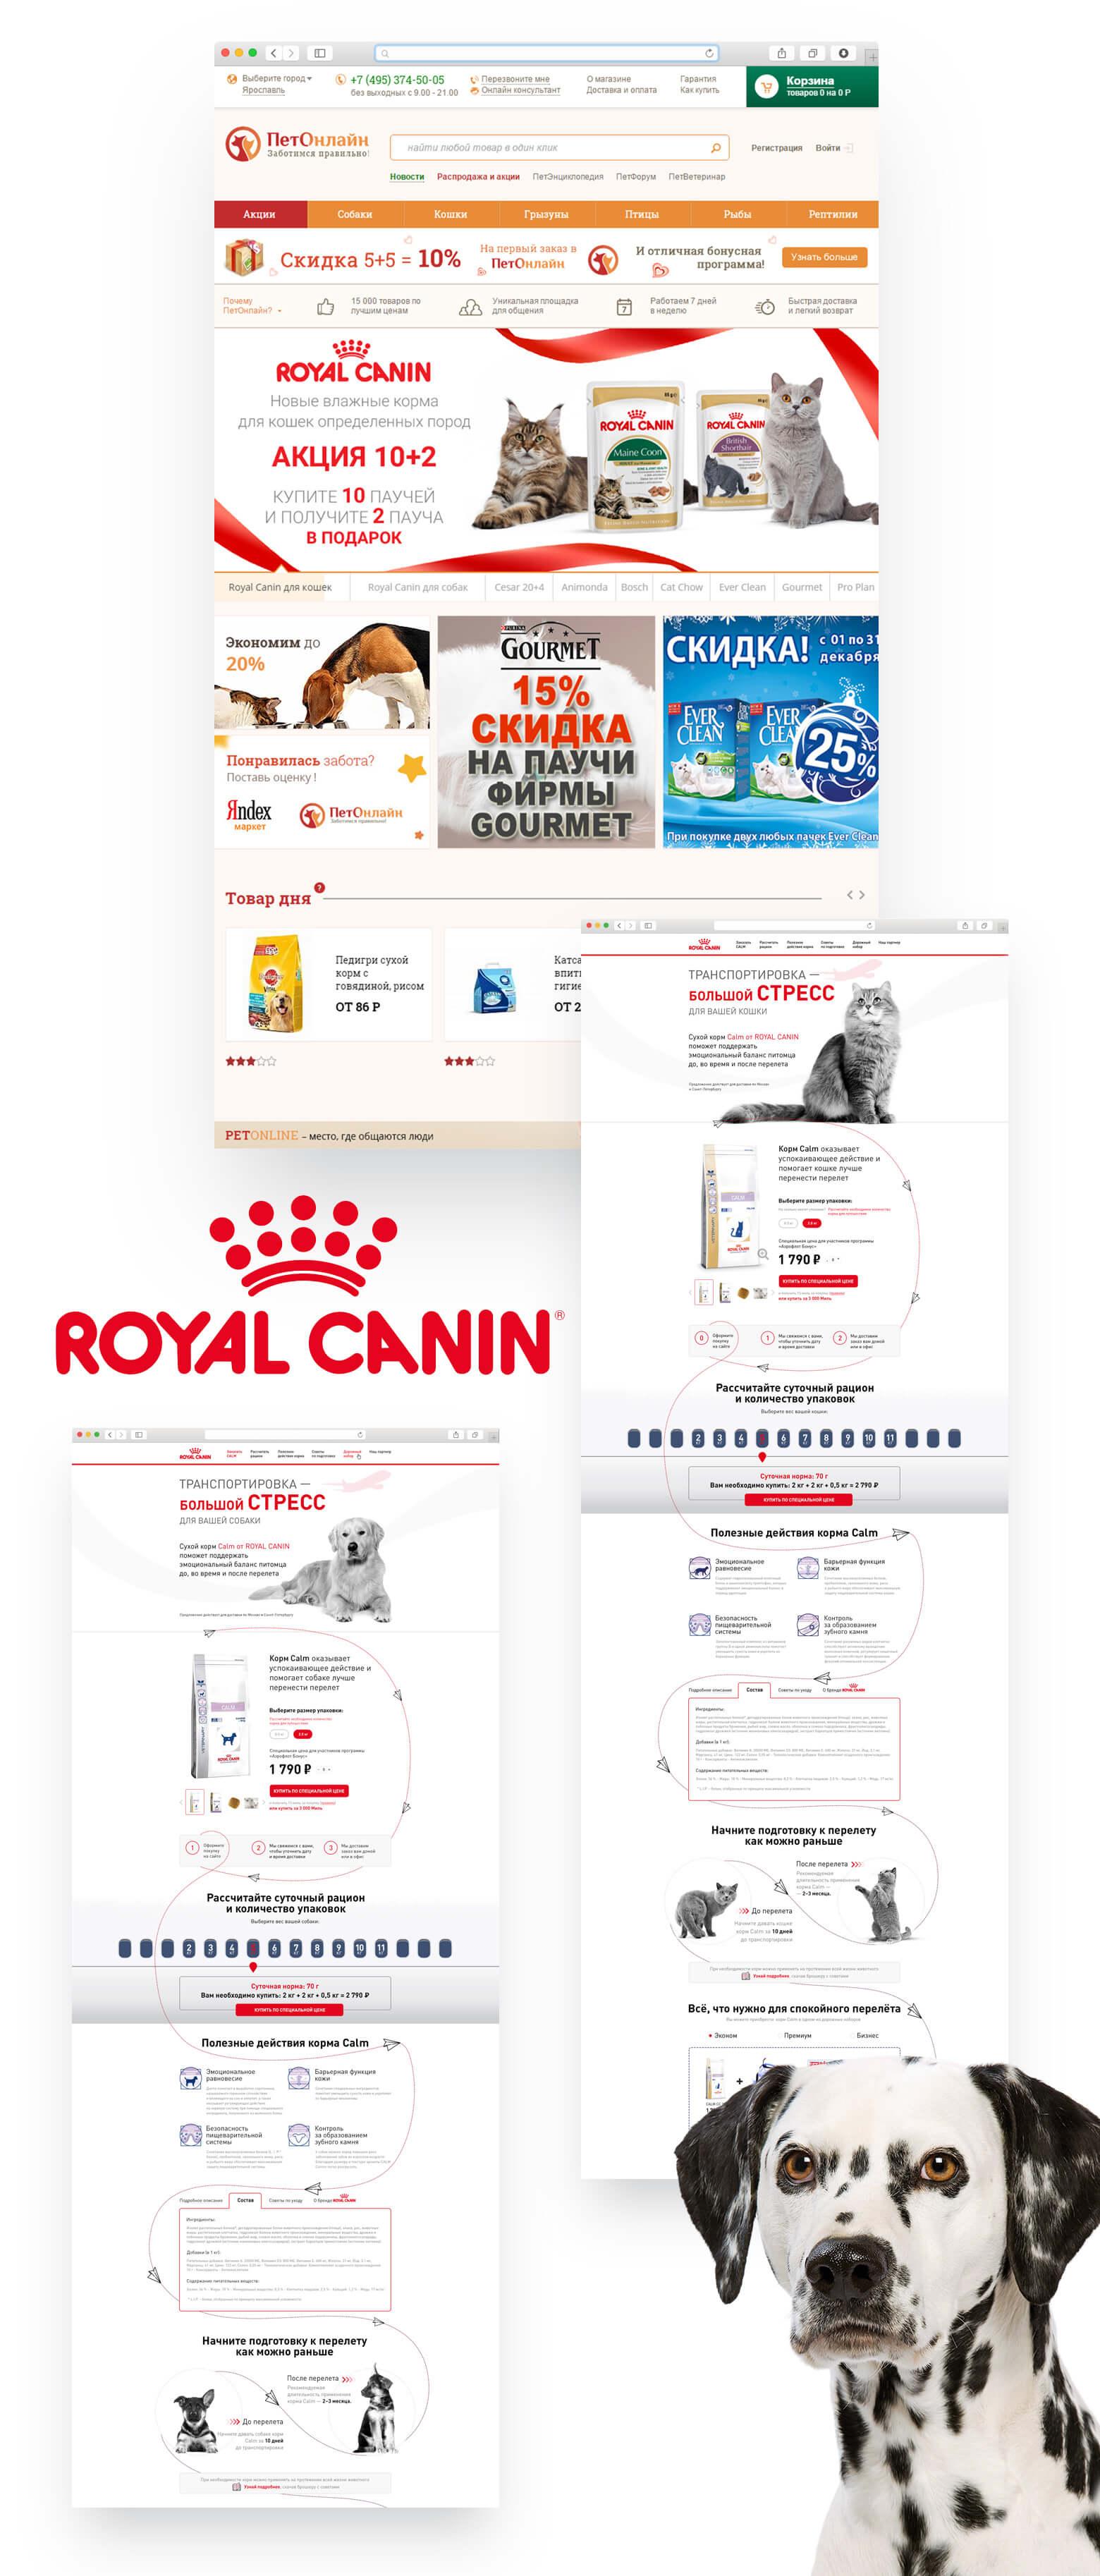 f2ade1e84514 Поддержка и развитие бренд-зон компании Royal Canin на корпоративном сайте  и сайтах партнеров